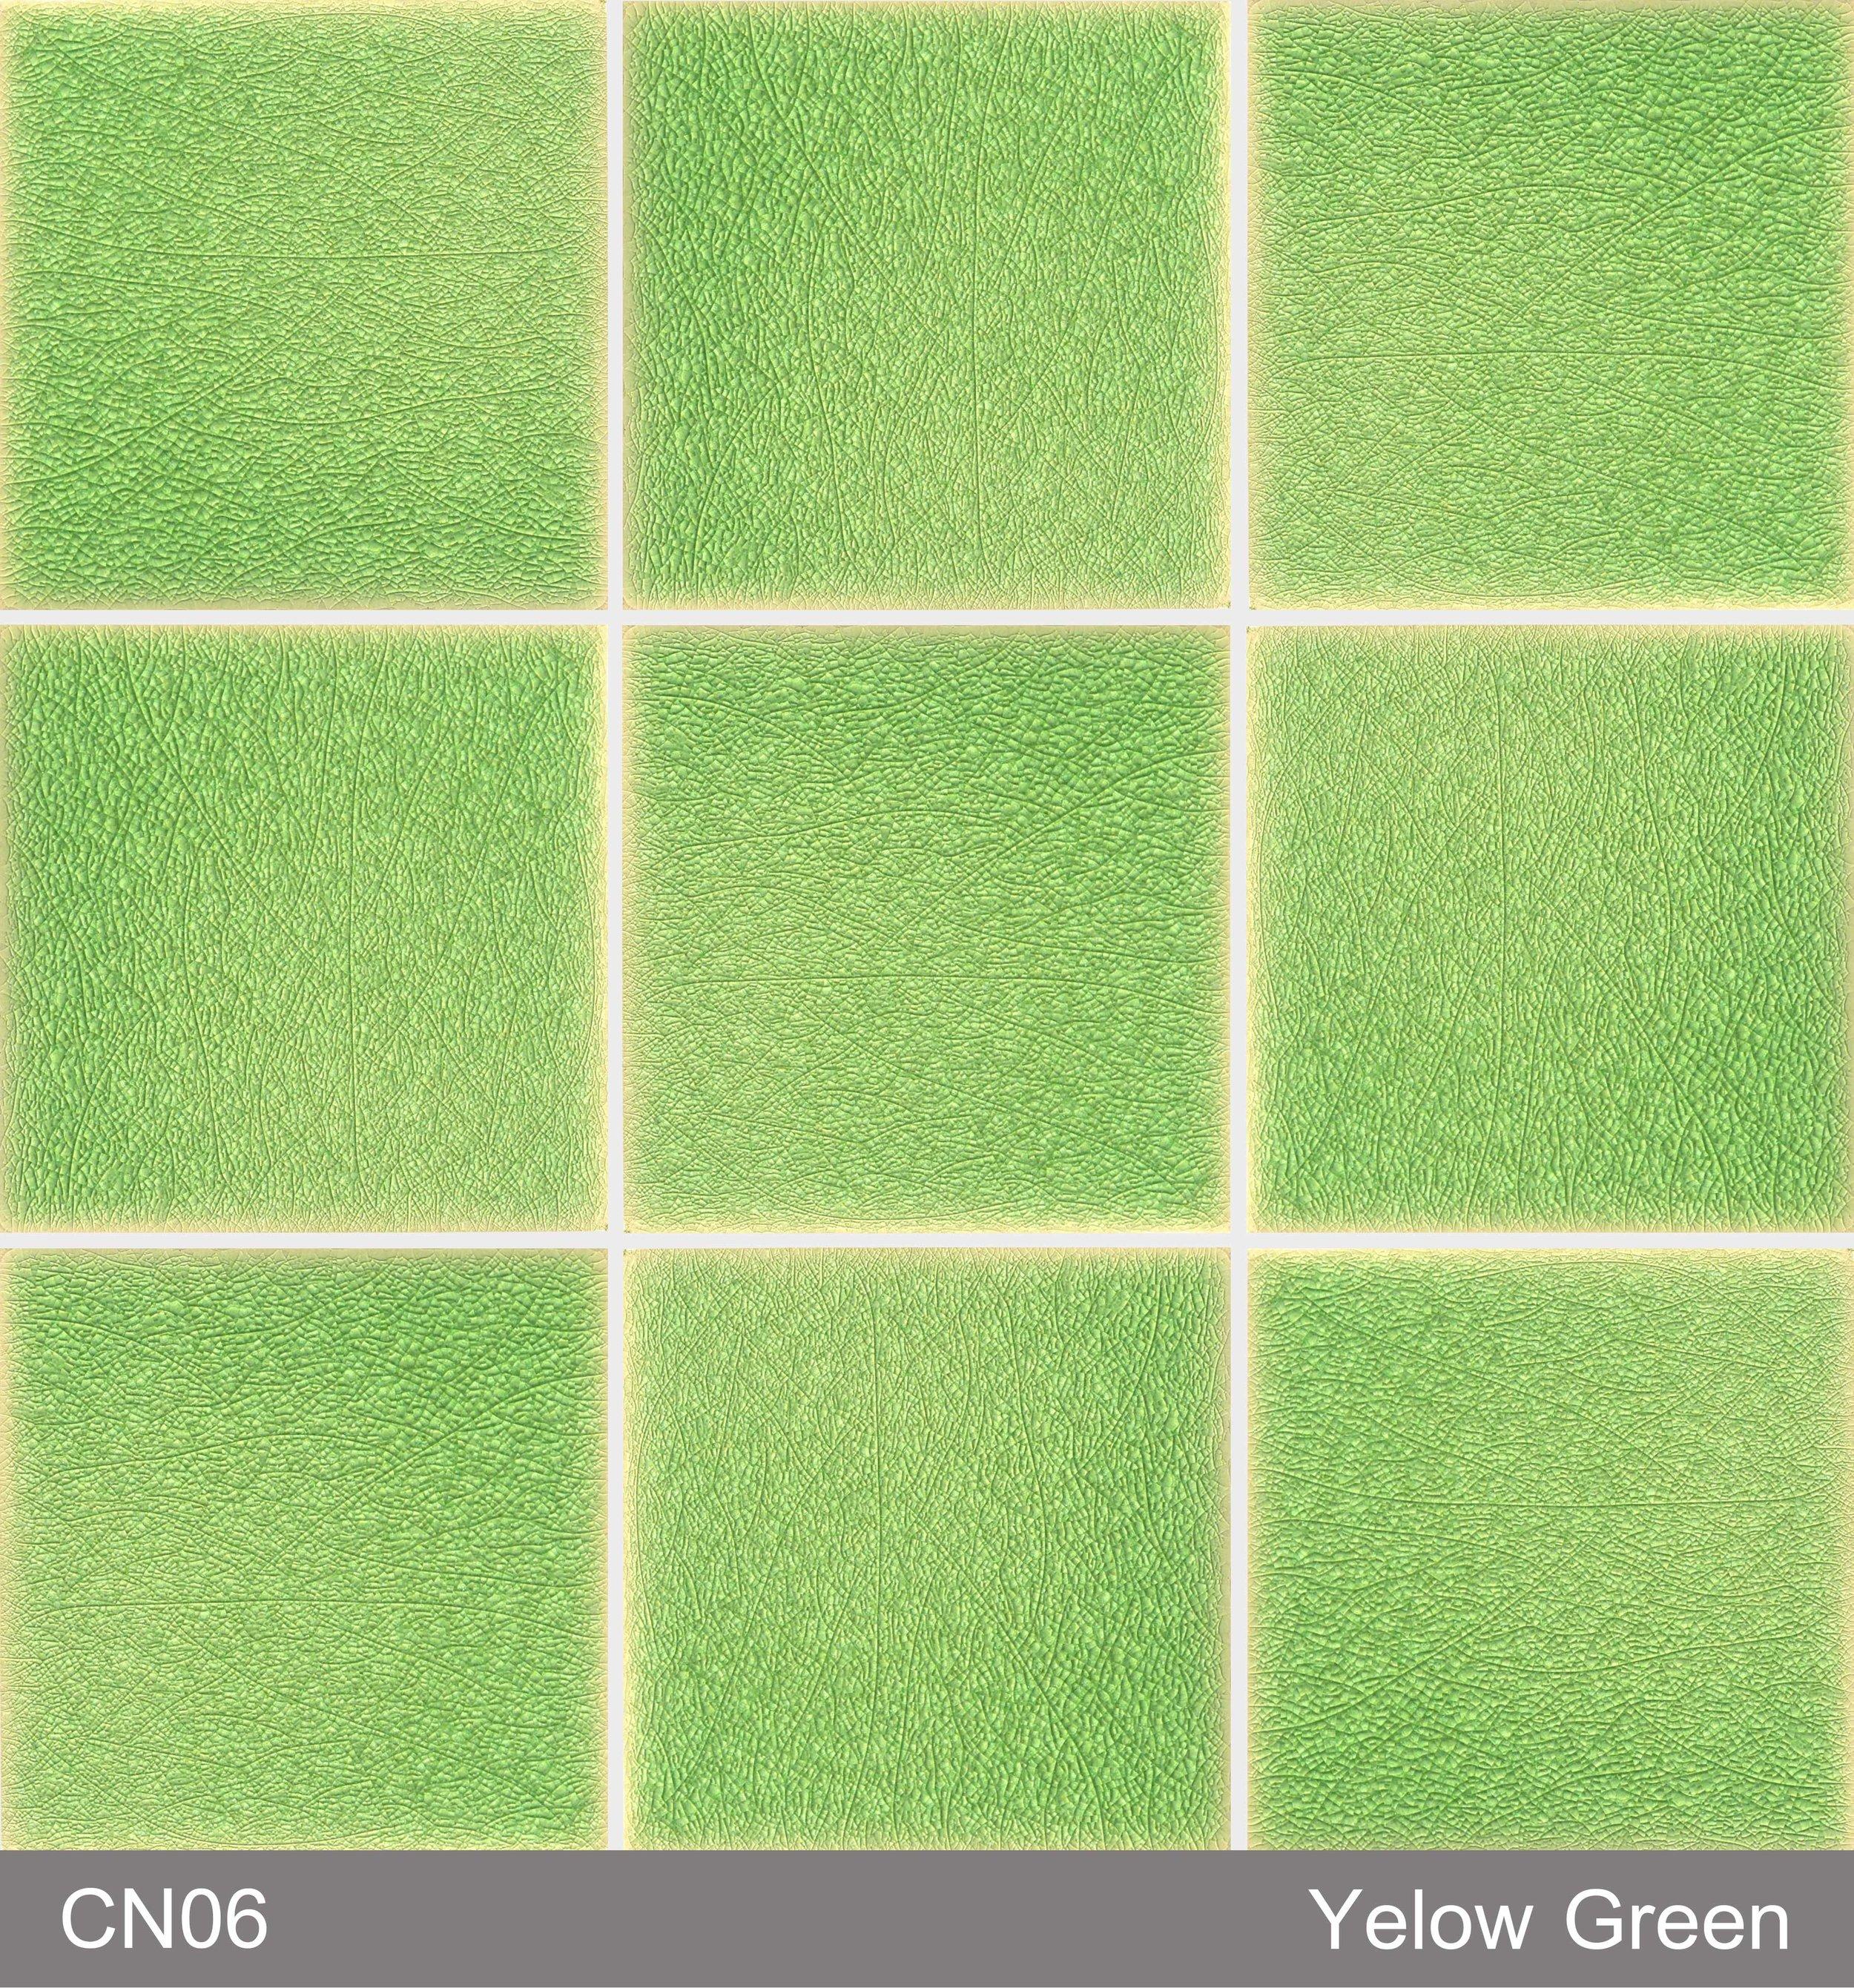 CN06 : Yellow green